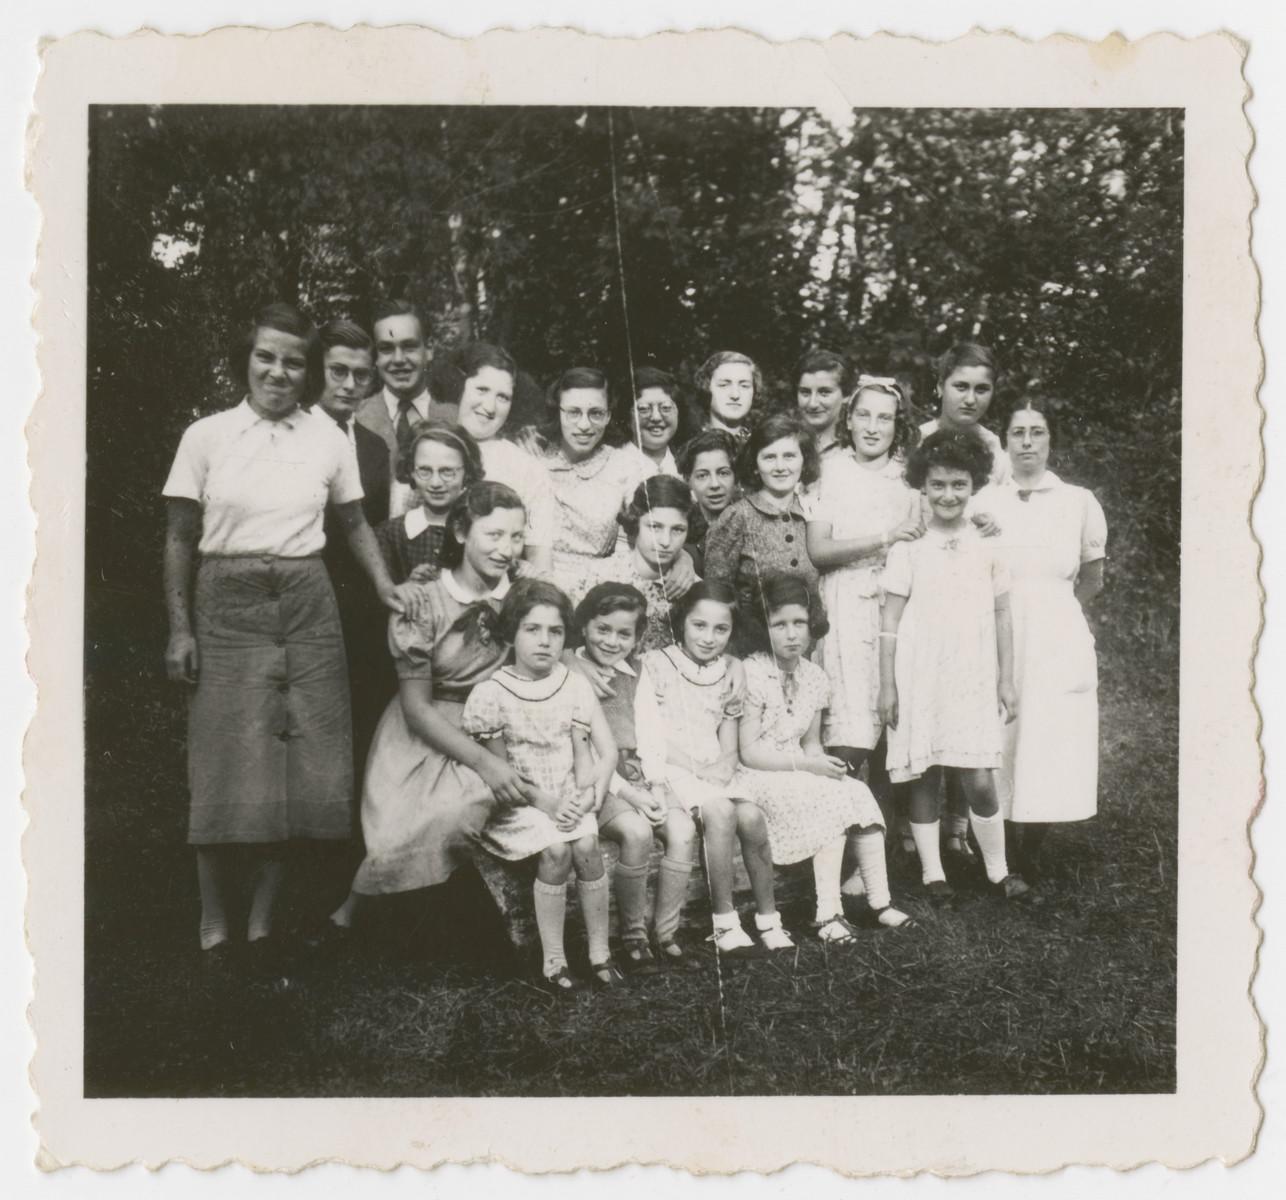 Group portrait of Jewish children hiding in a children's home in Bergerac.